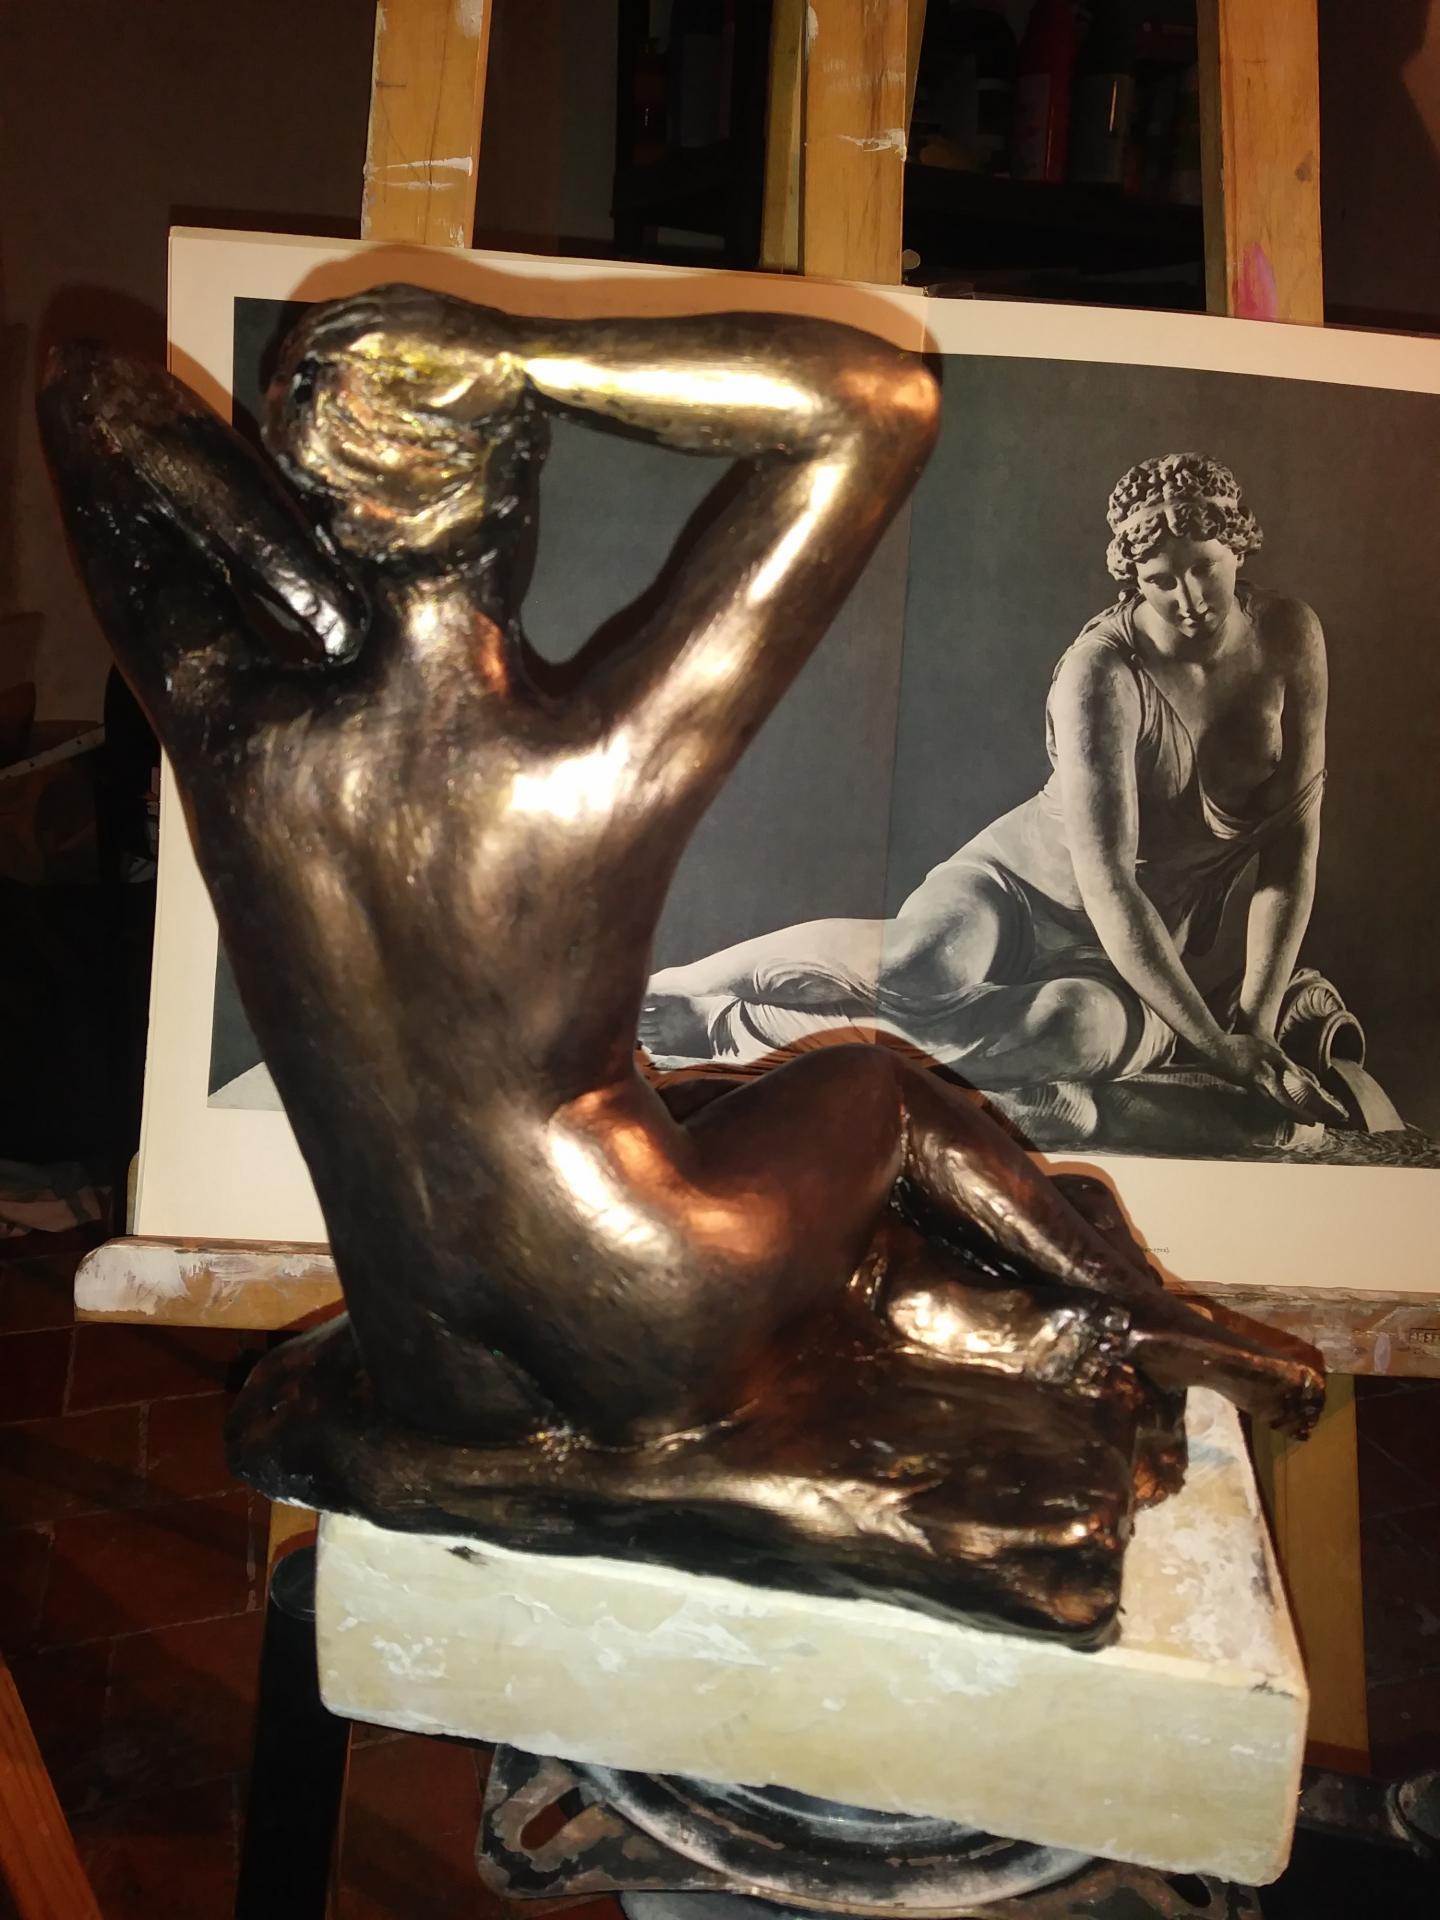 Nue sculpture en terre patinee de jean joseph chevalier 4